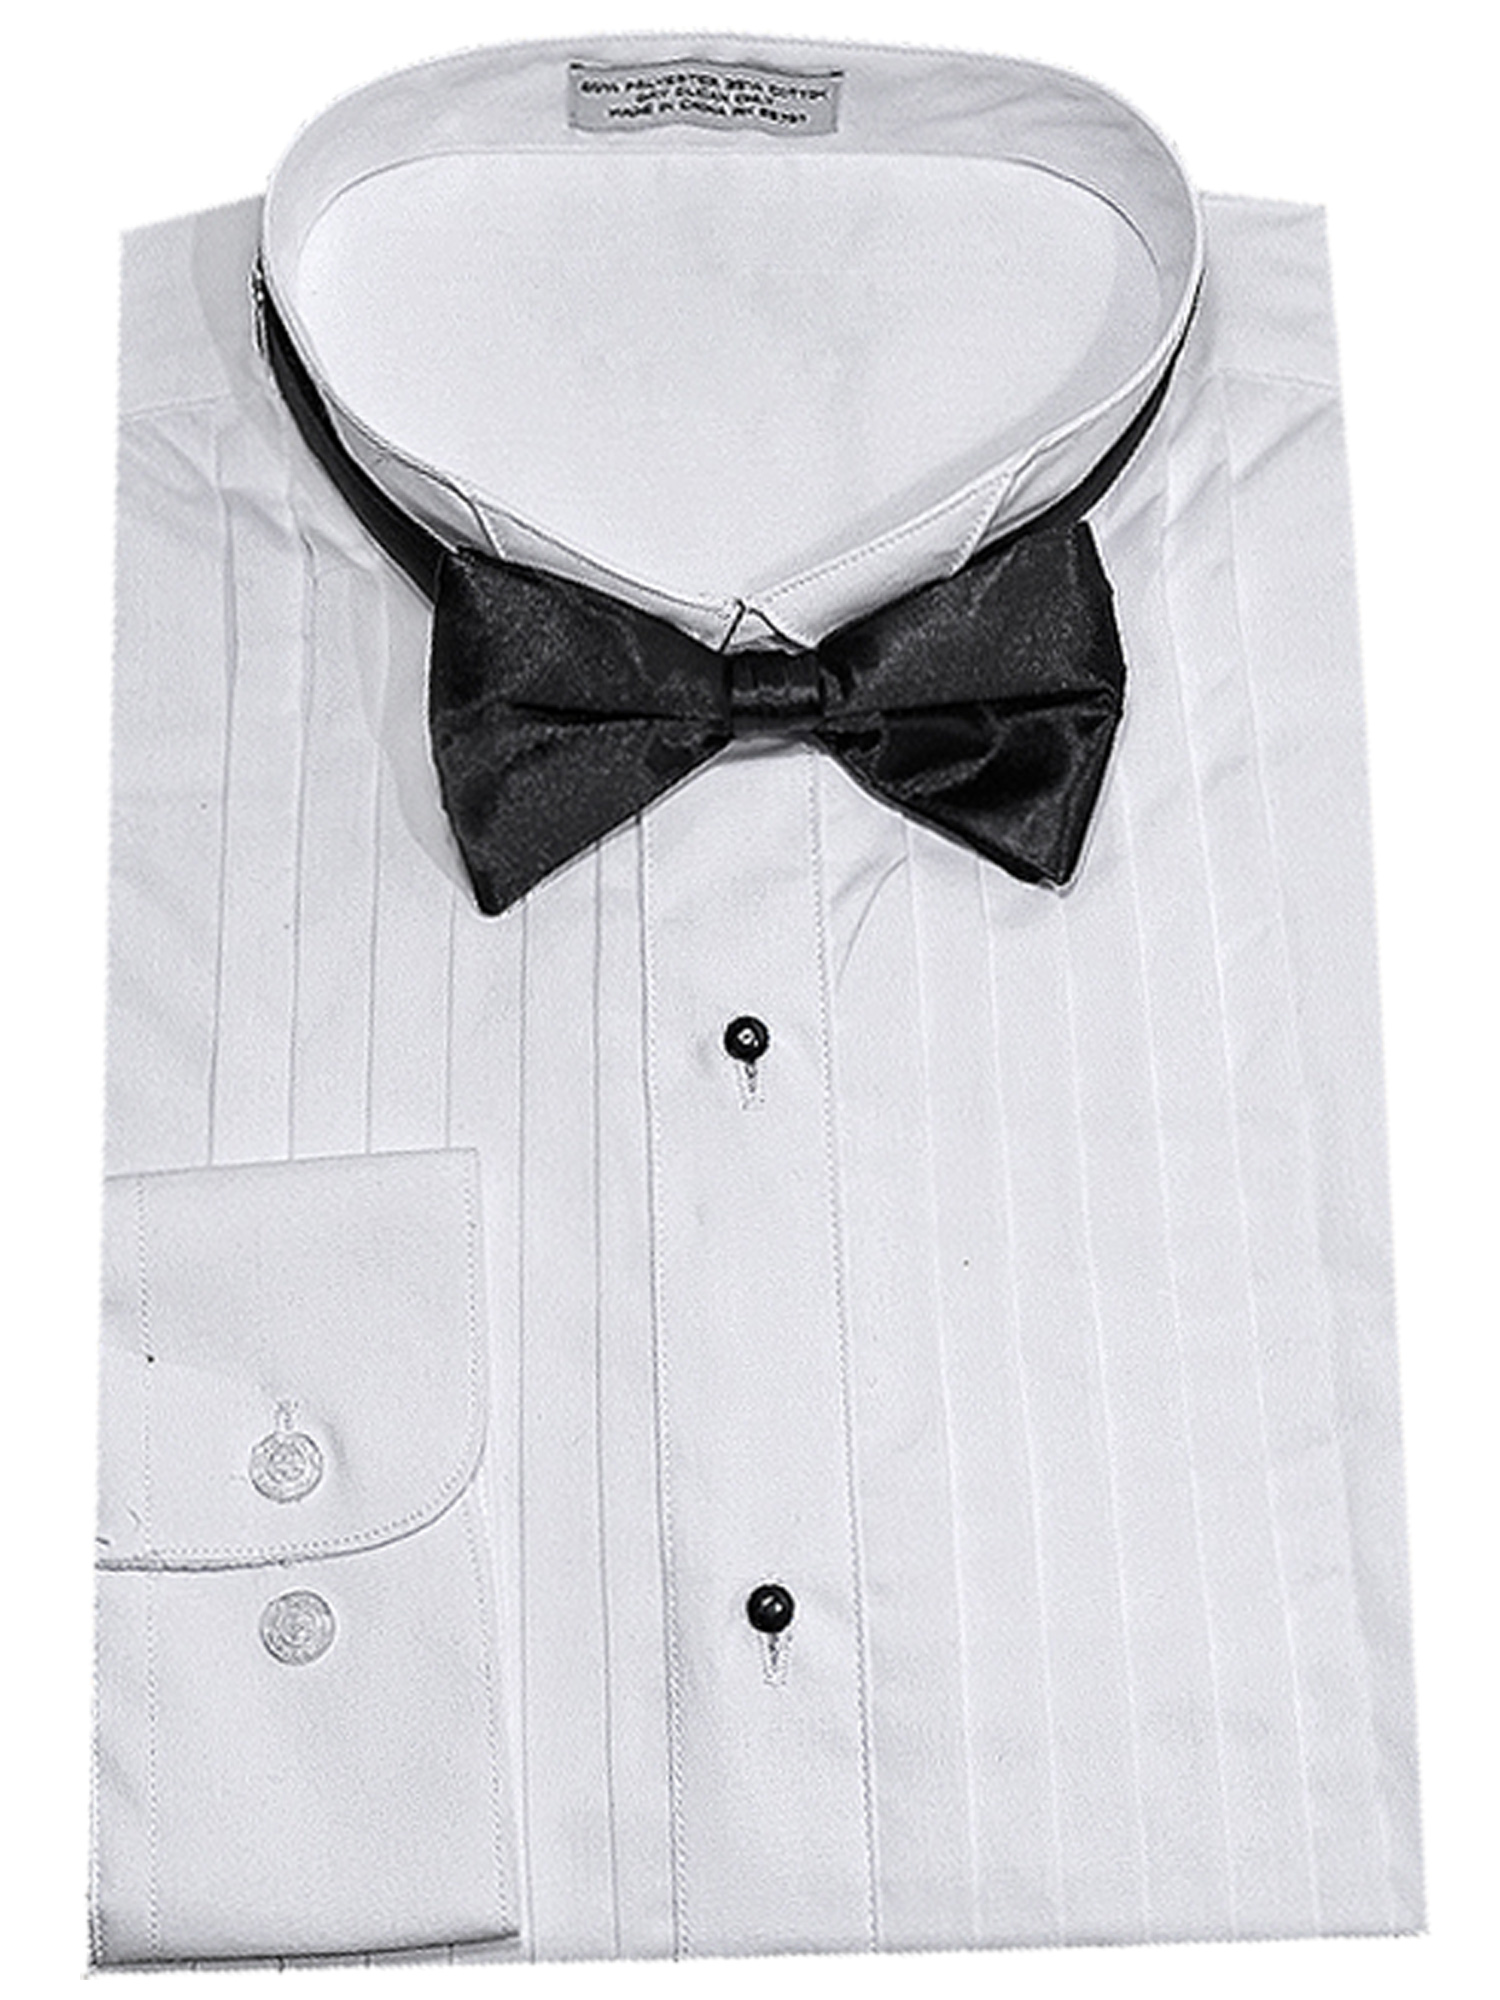 men's half inch pleat tuxedo shirt w bow tie